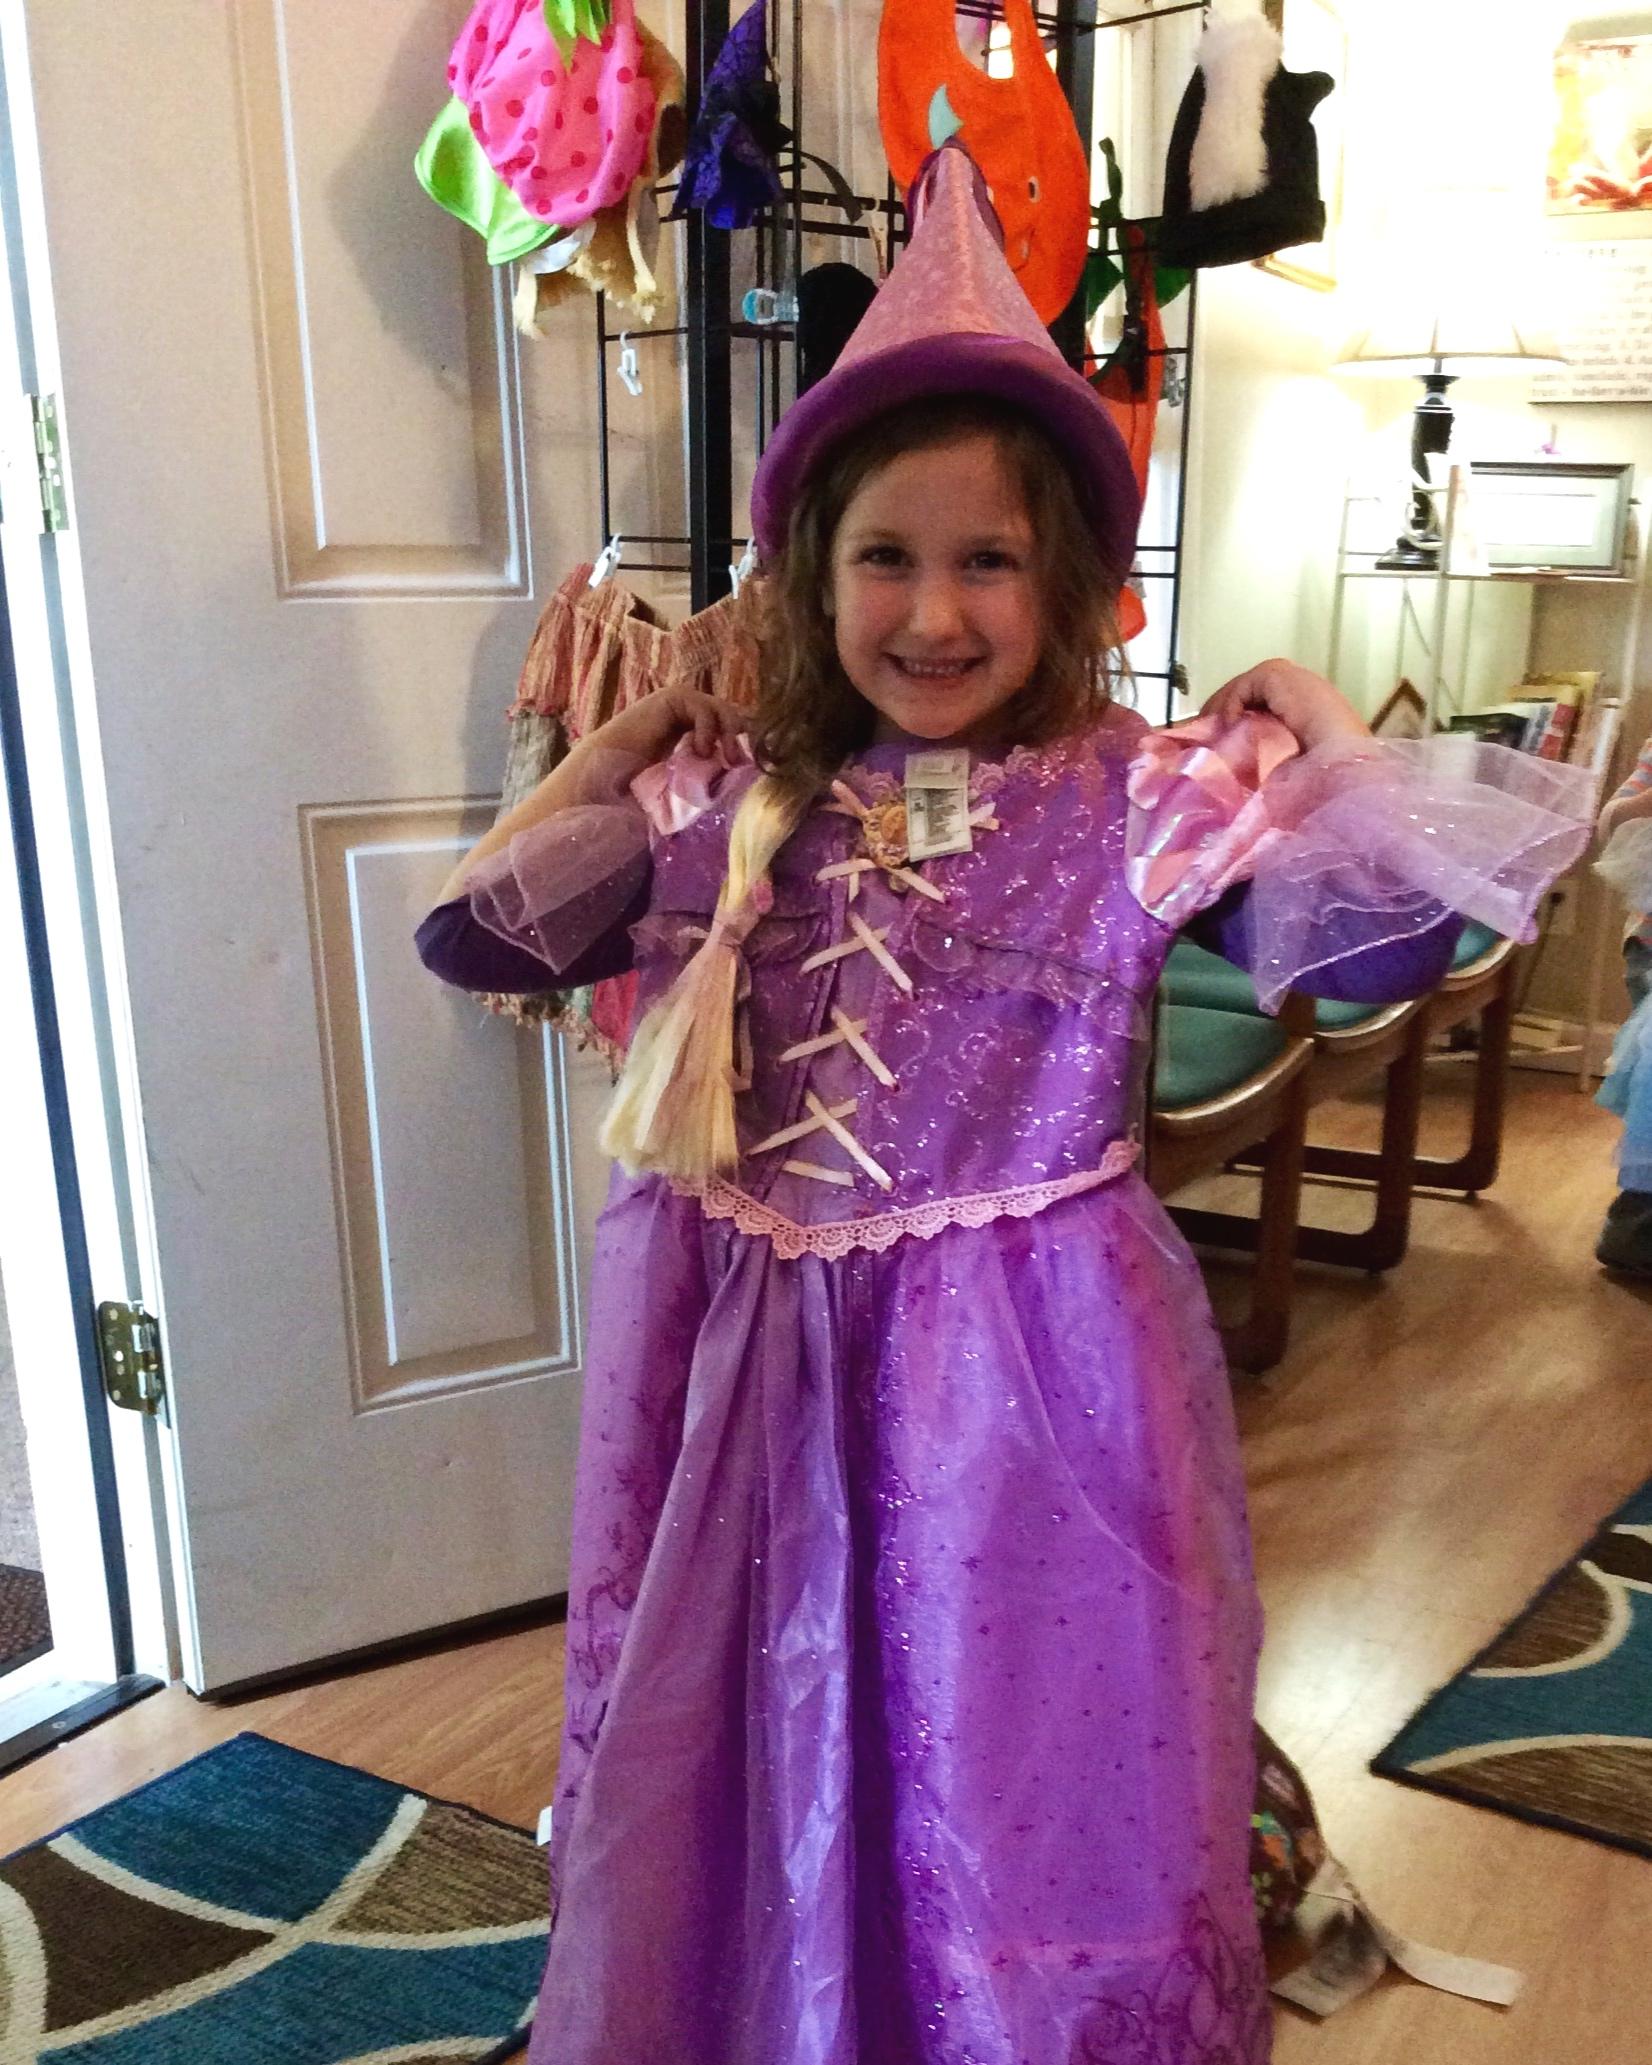 Copy+of+LLCMC+elsa+costume+girl.jpg